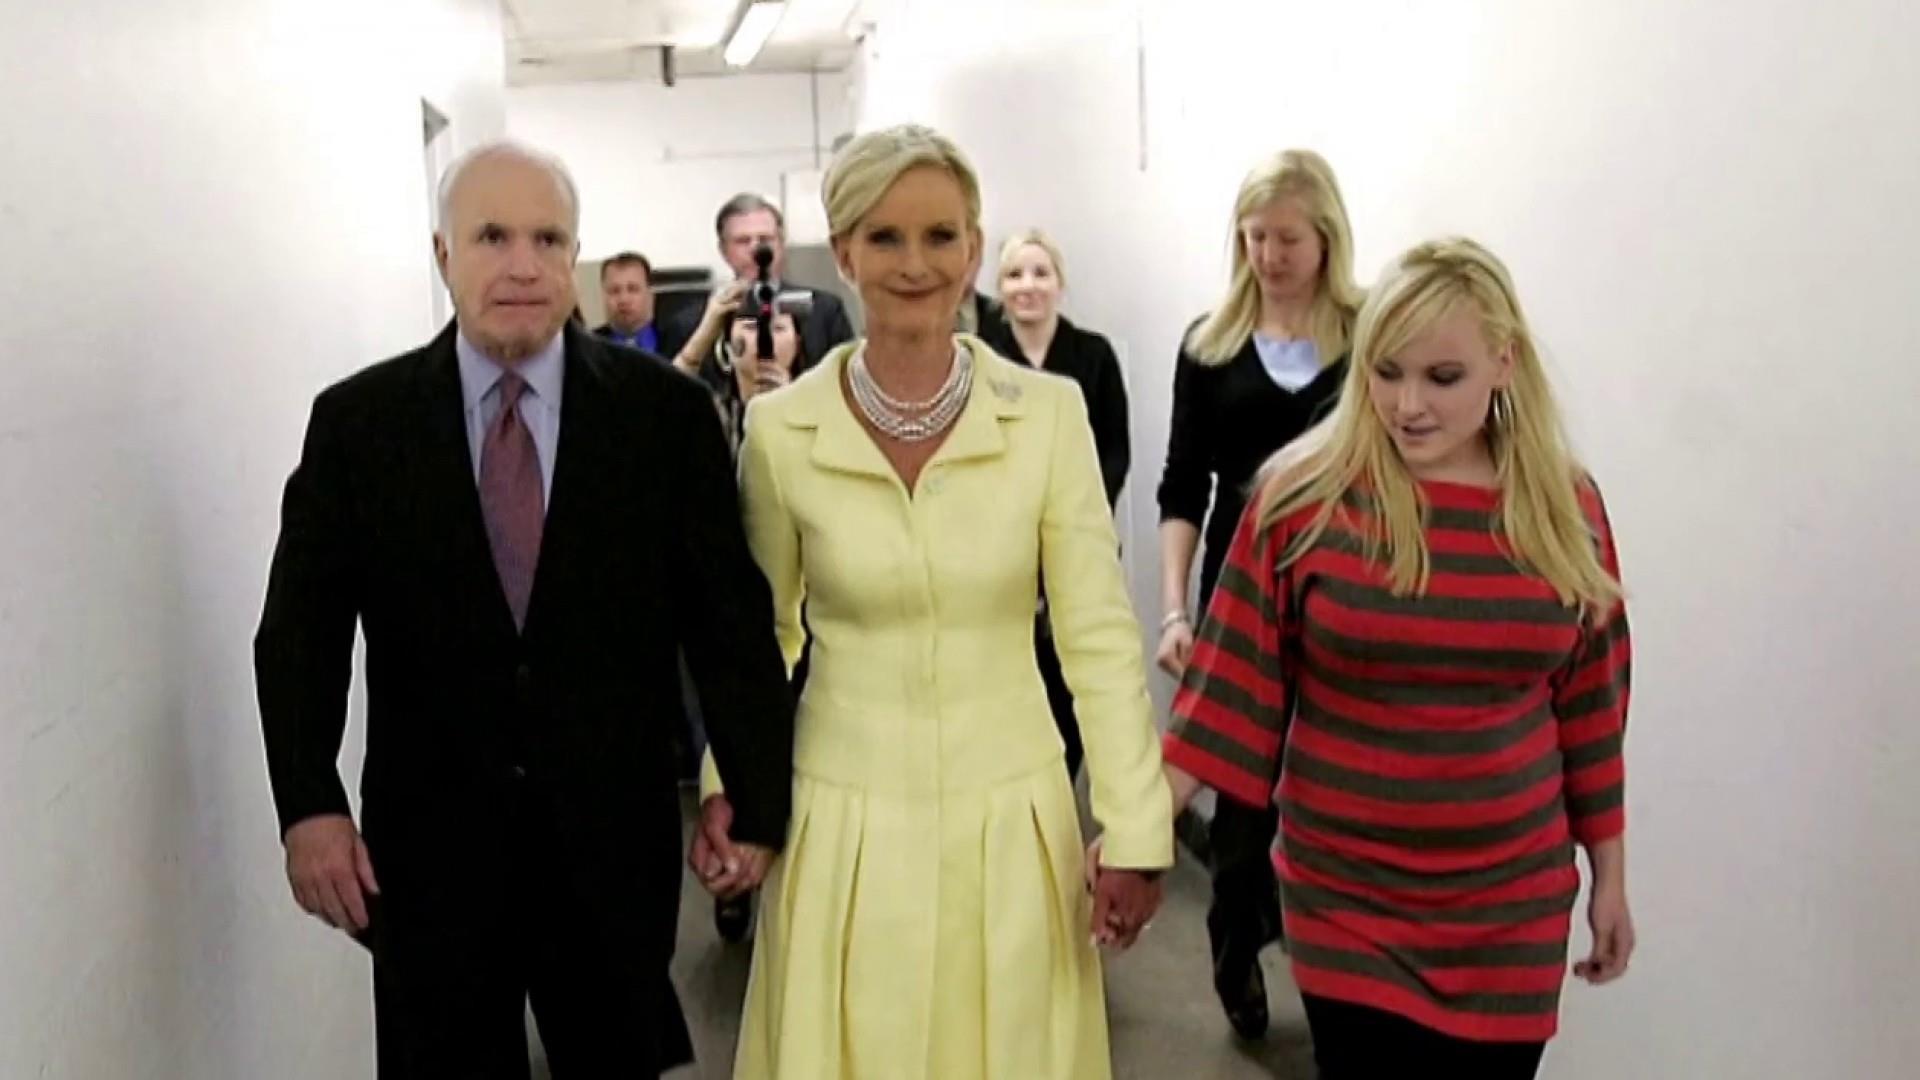 Meghan McCain remembers her father Sen. John McCain